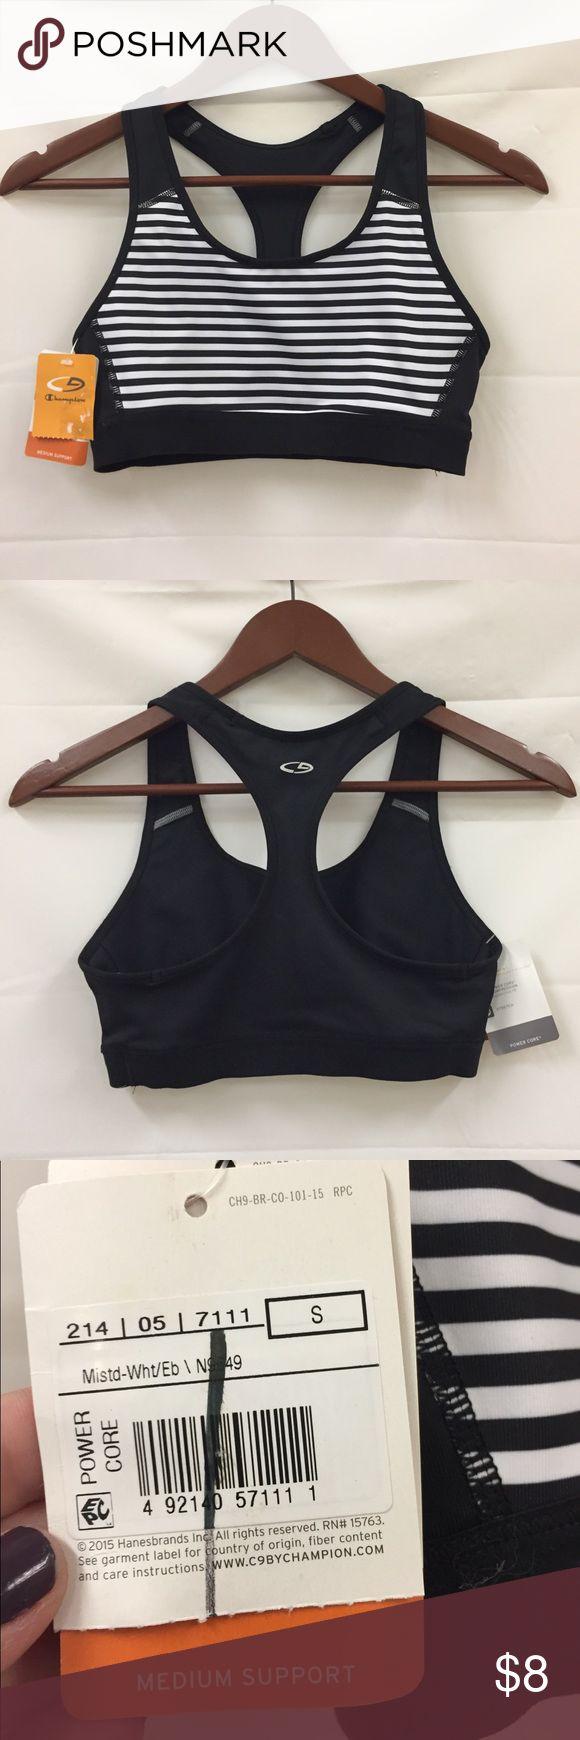 New champion sports bra size small Medium support. Champion Intimates & Sleepwear Bras